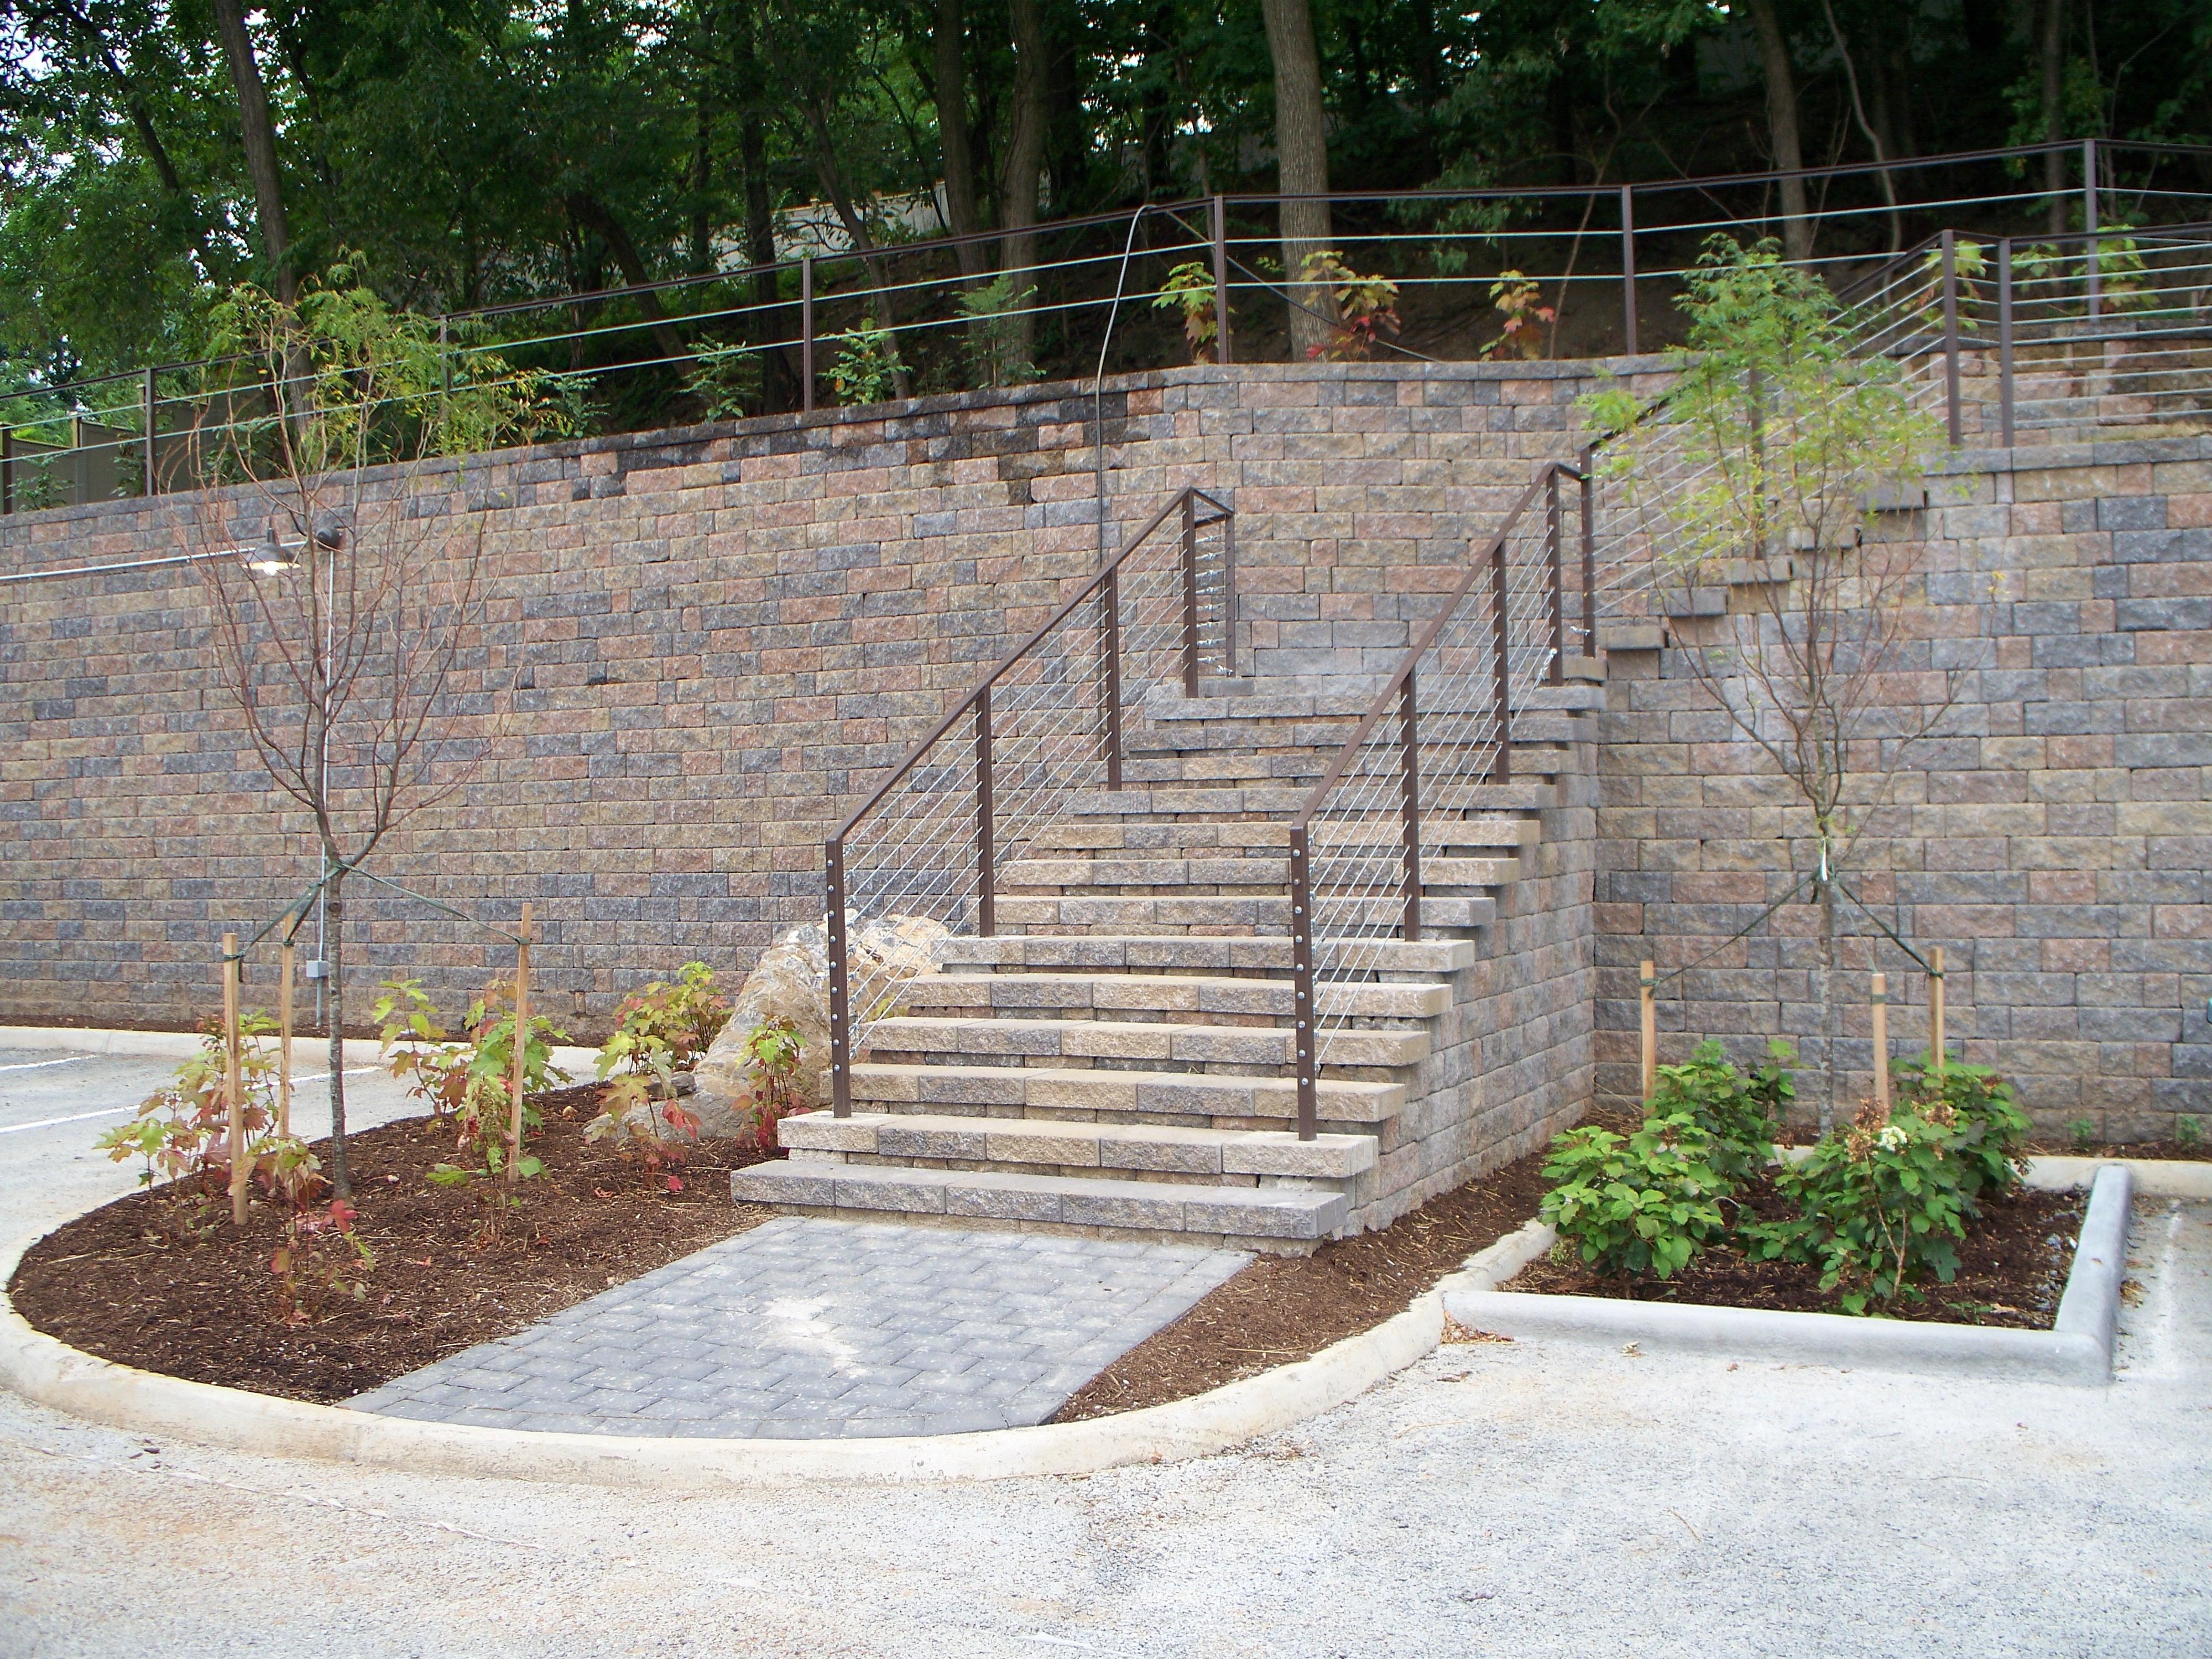 StoneLedge stairs